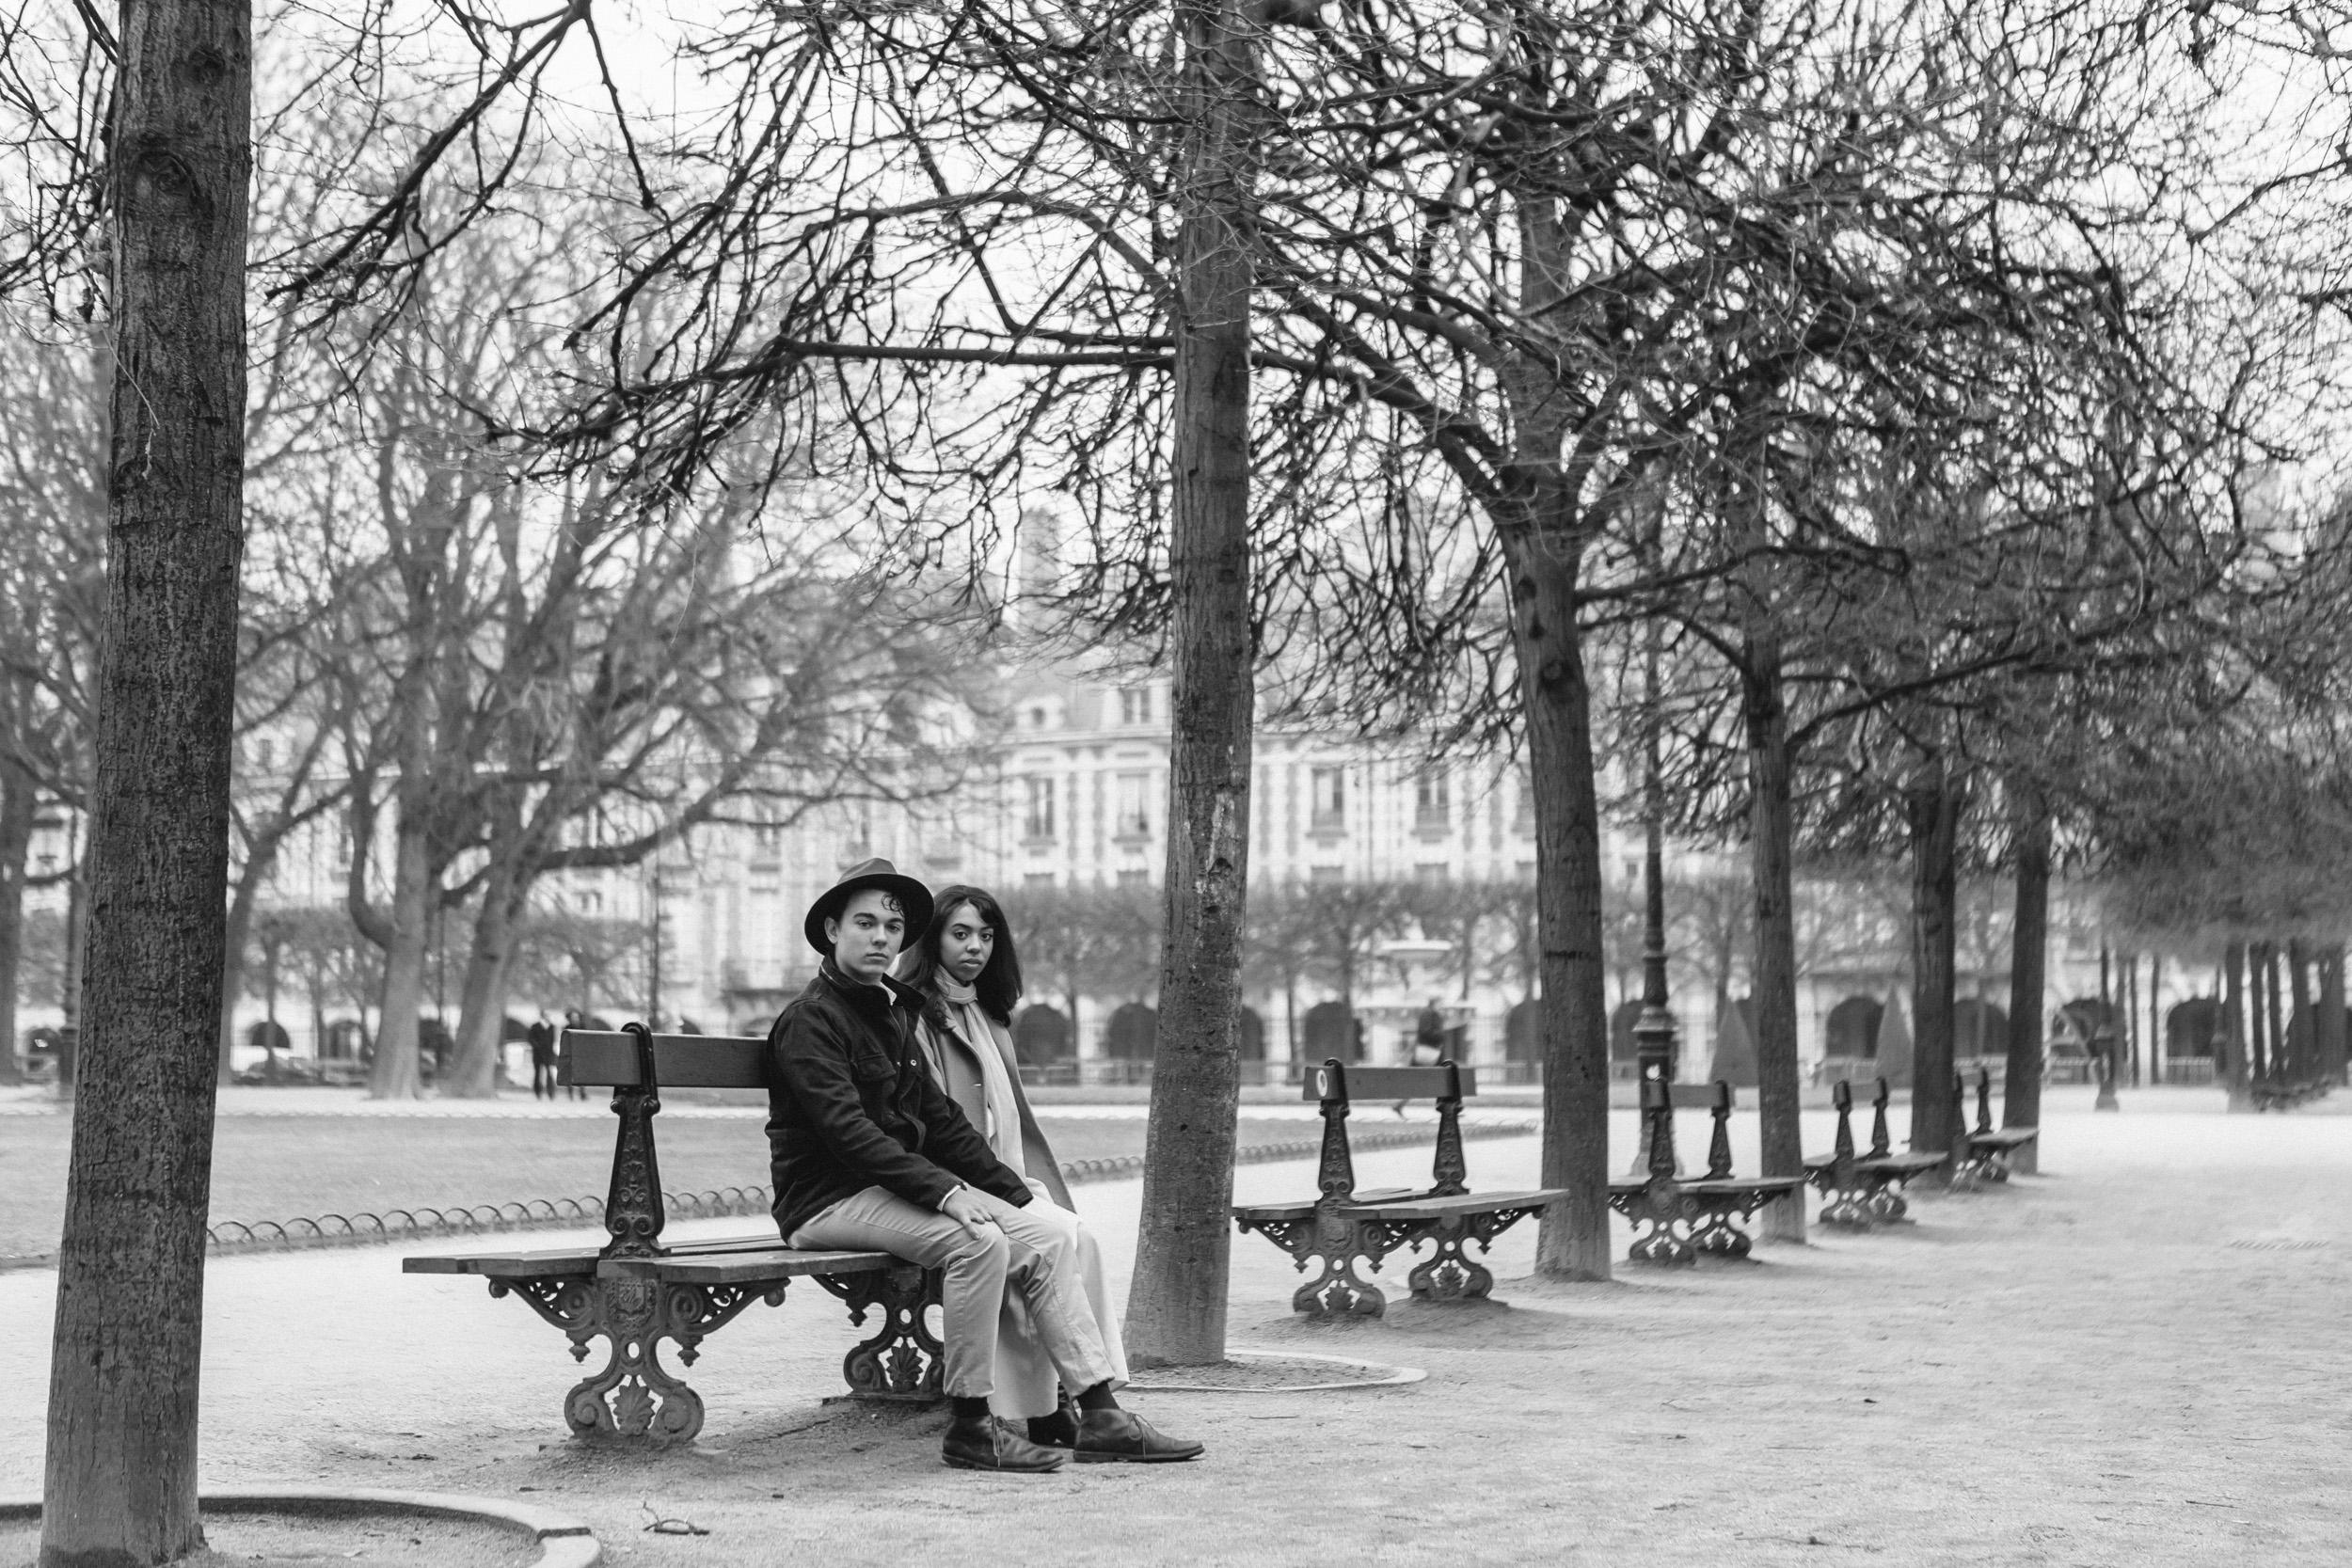 Couple session fine art portrait of The Mango Market photo duo captured by Paris Photographer Federico Guendel IheartParis www.iheartparis.fr